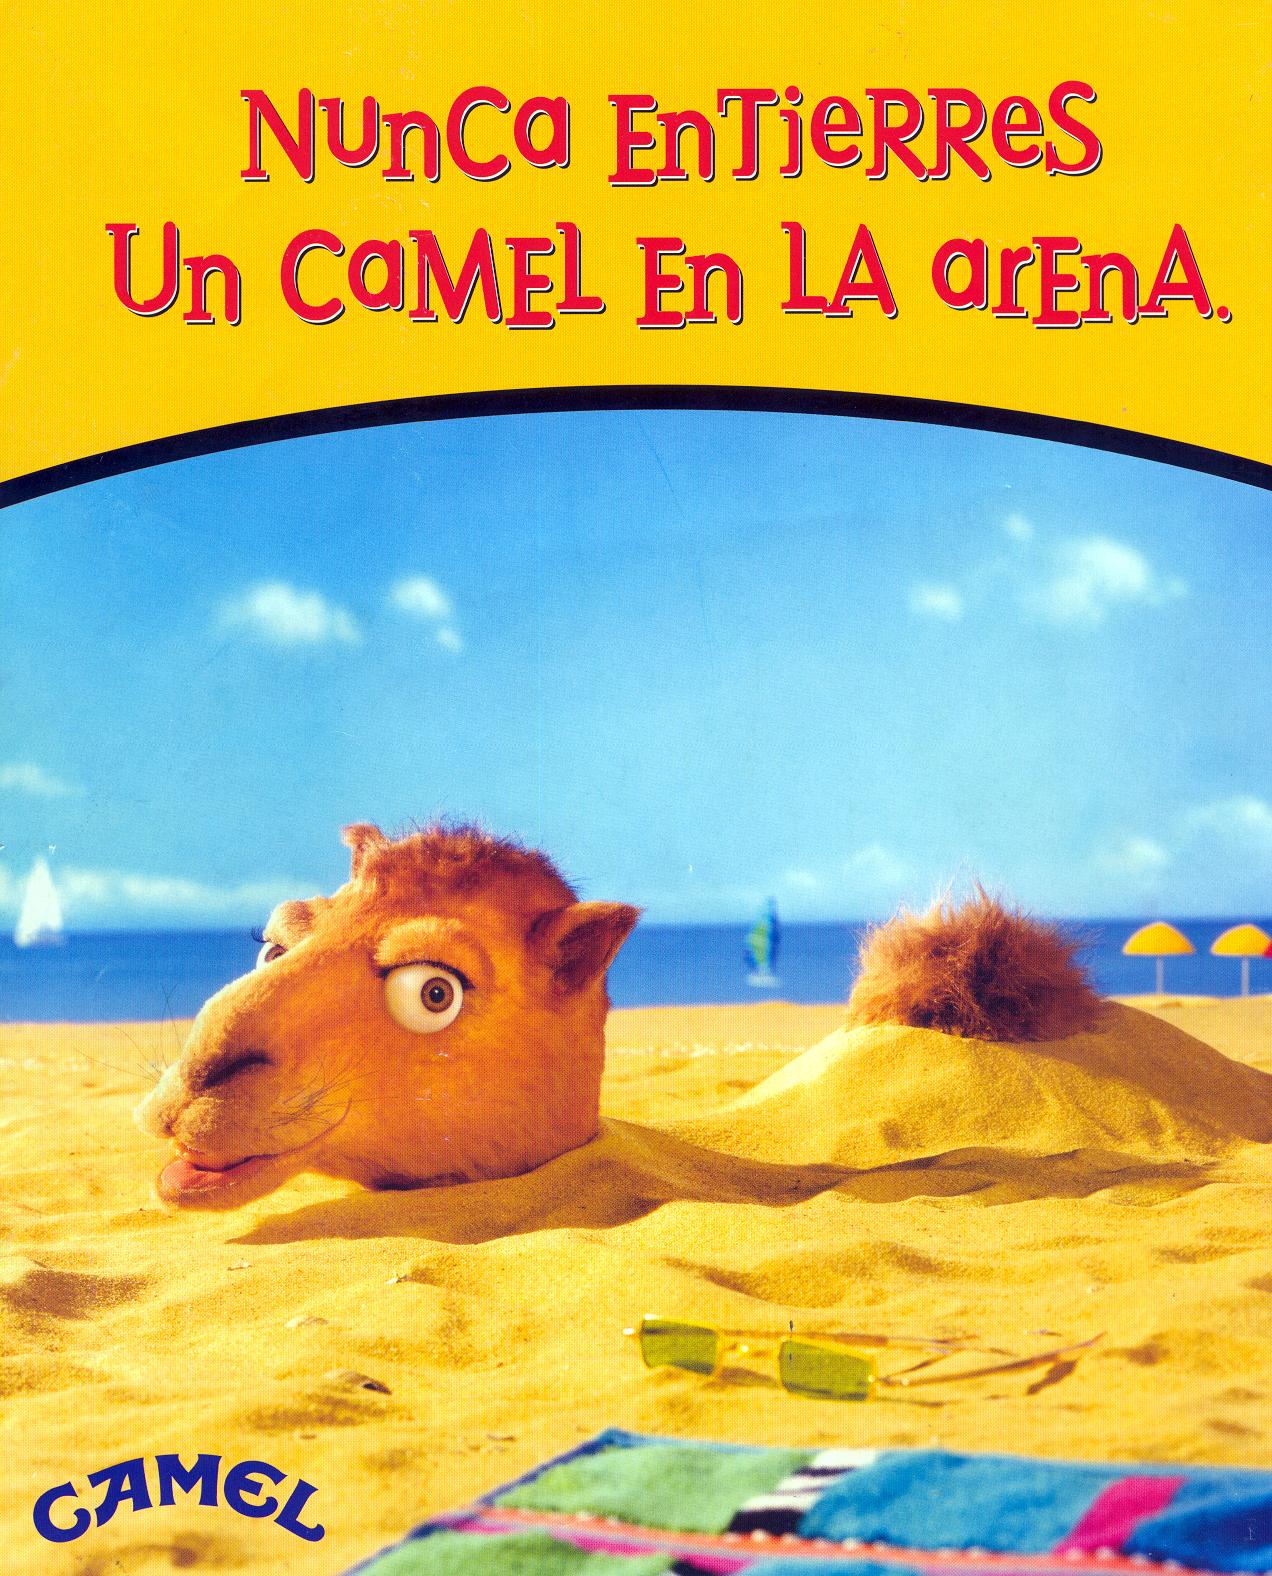 Camel_06